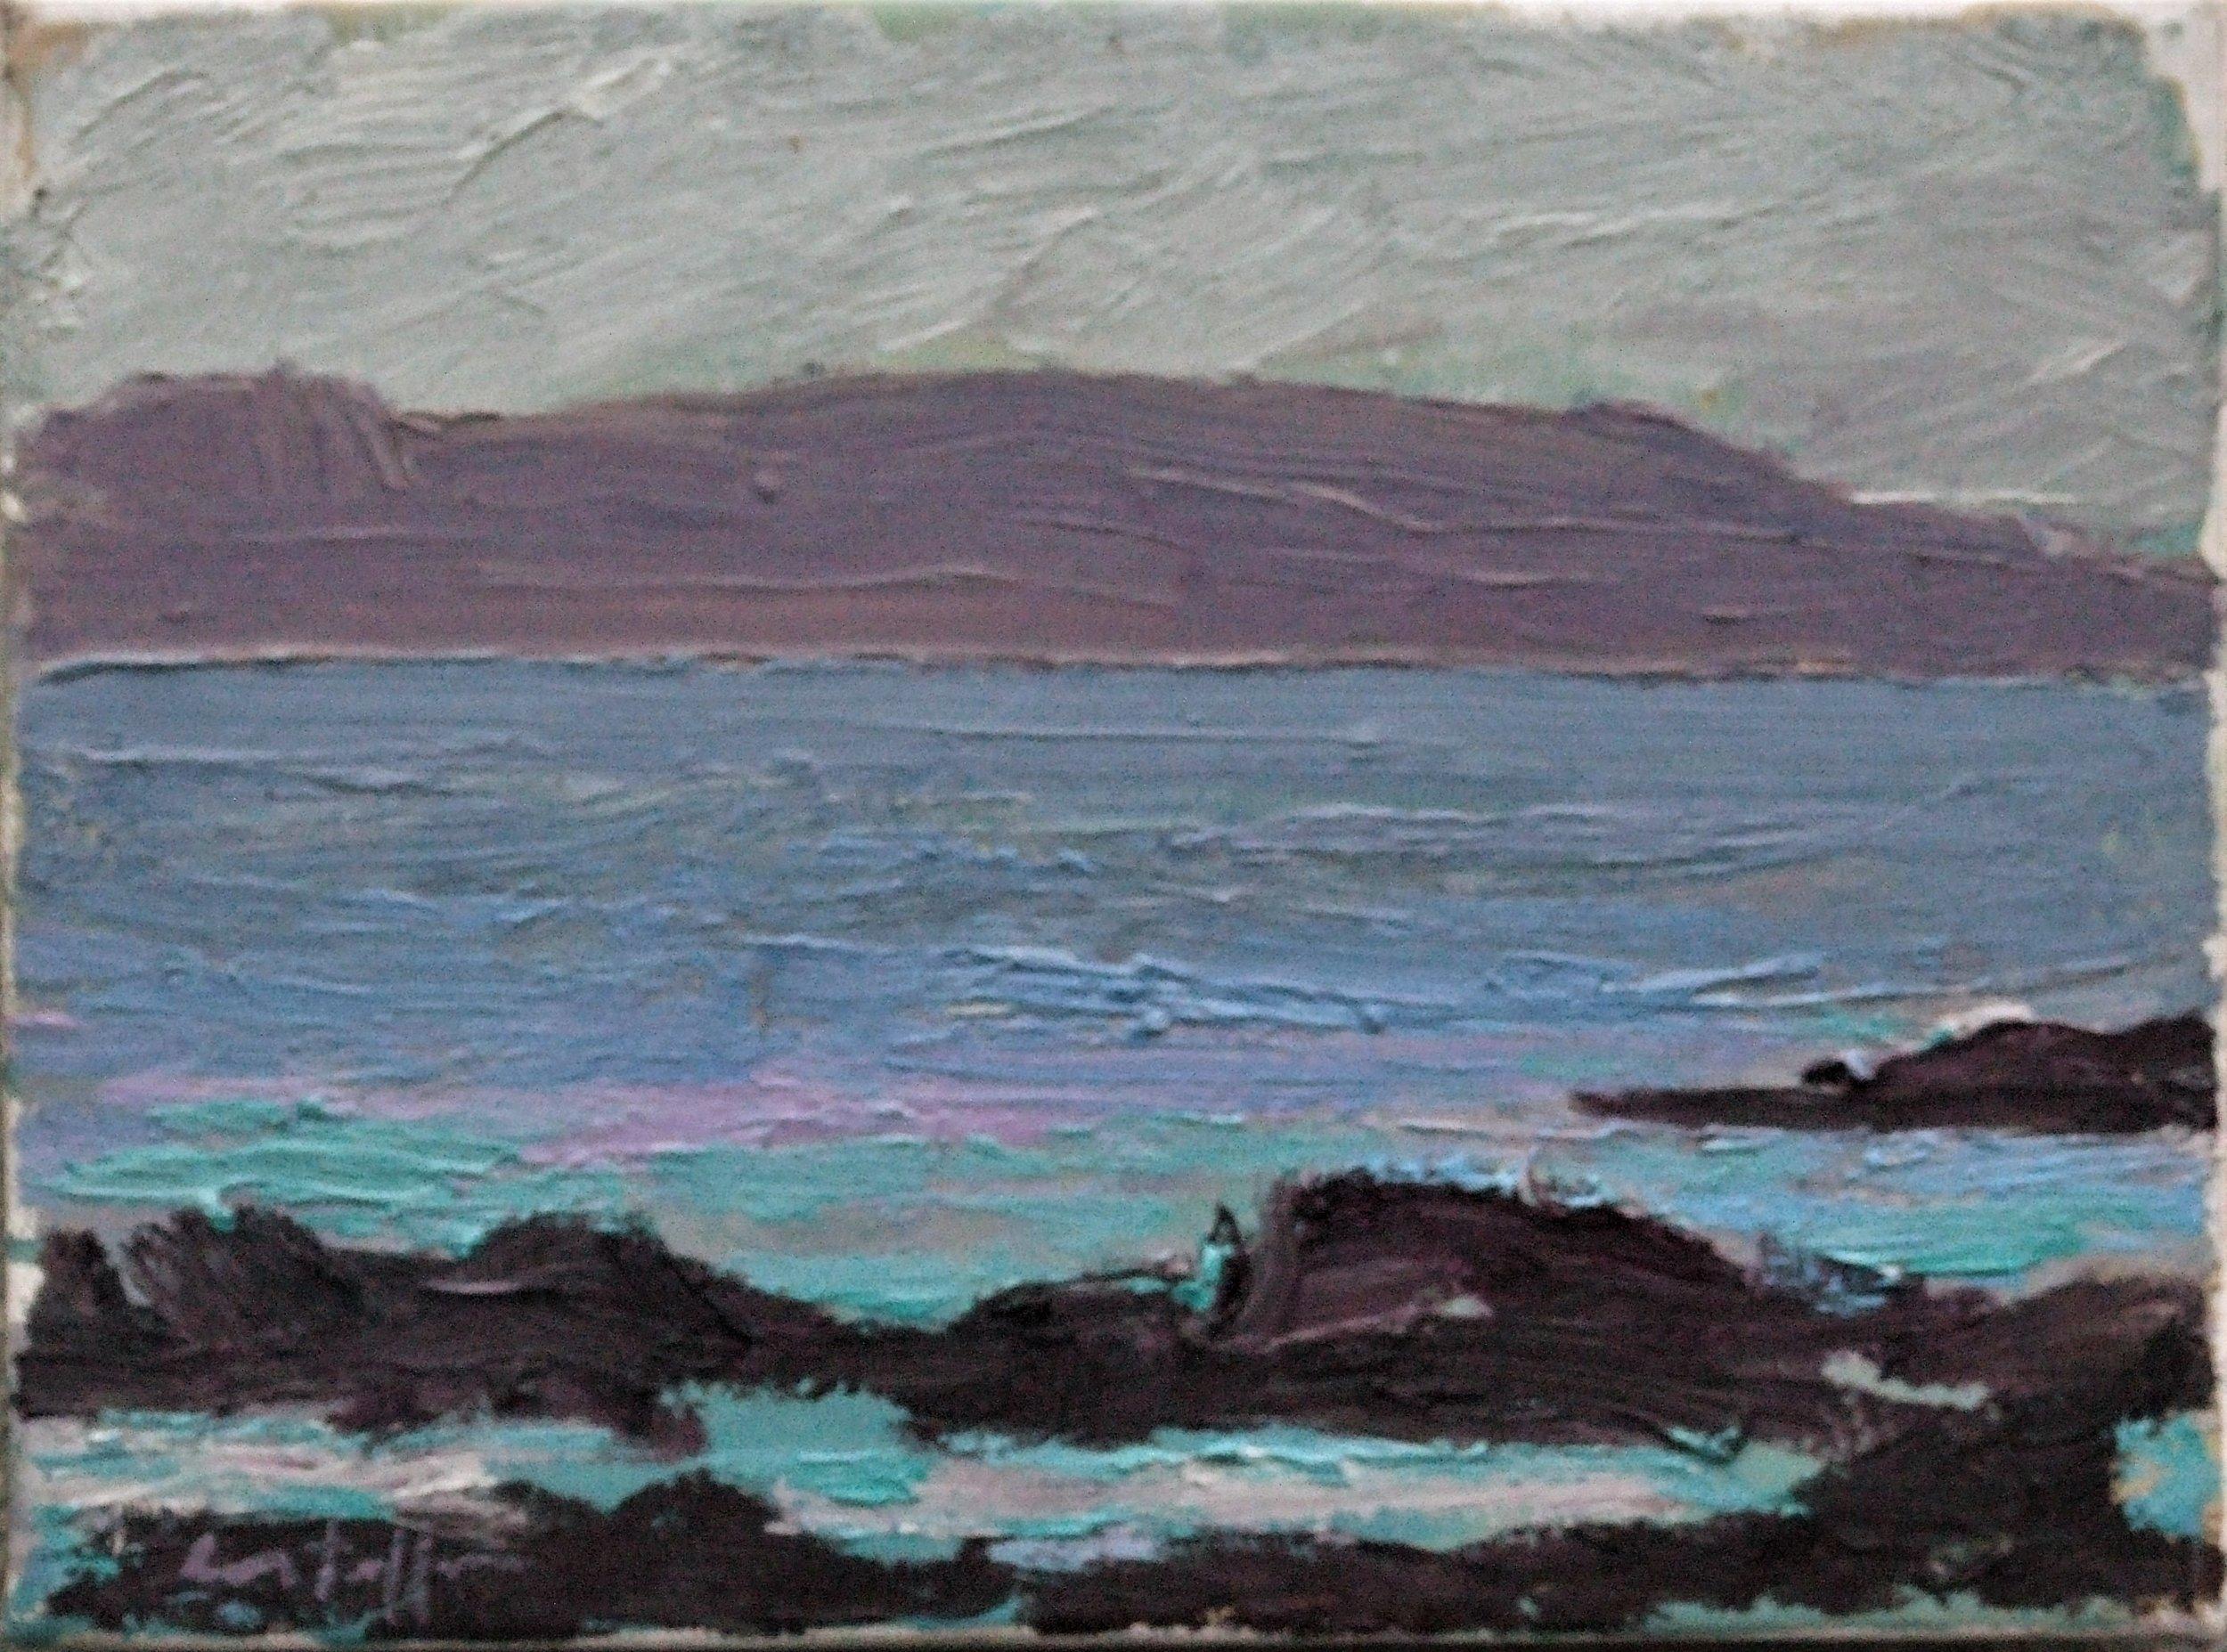 Shore Study, 2016, oil on canvas, 18 x 24 cm